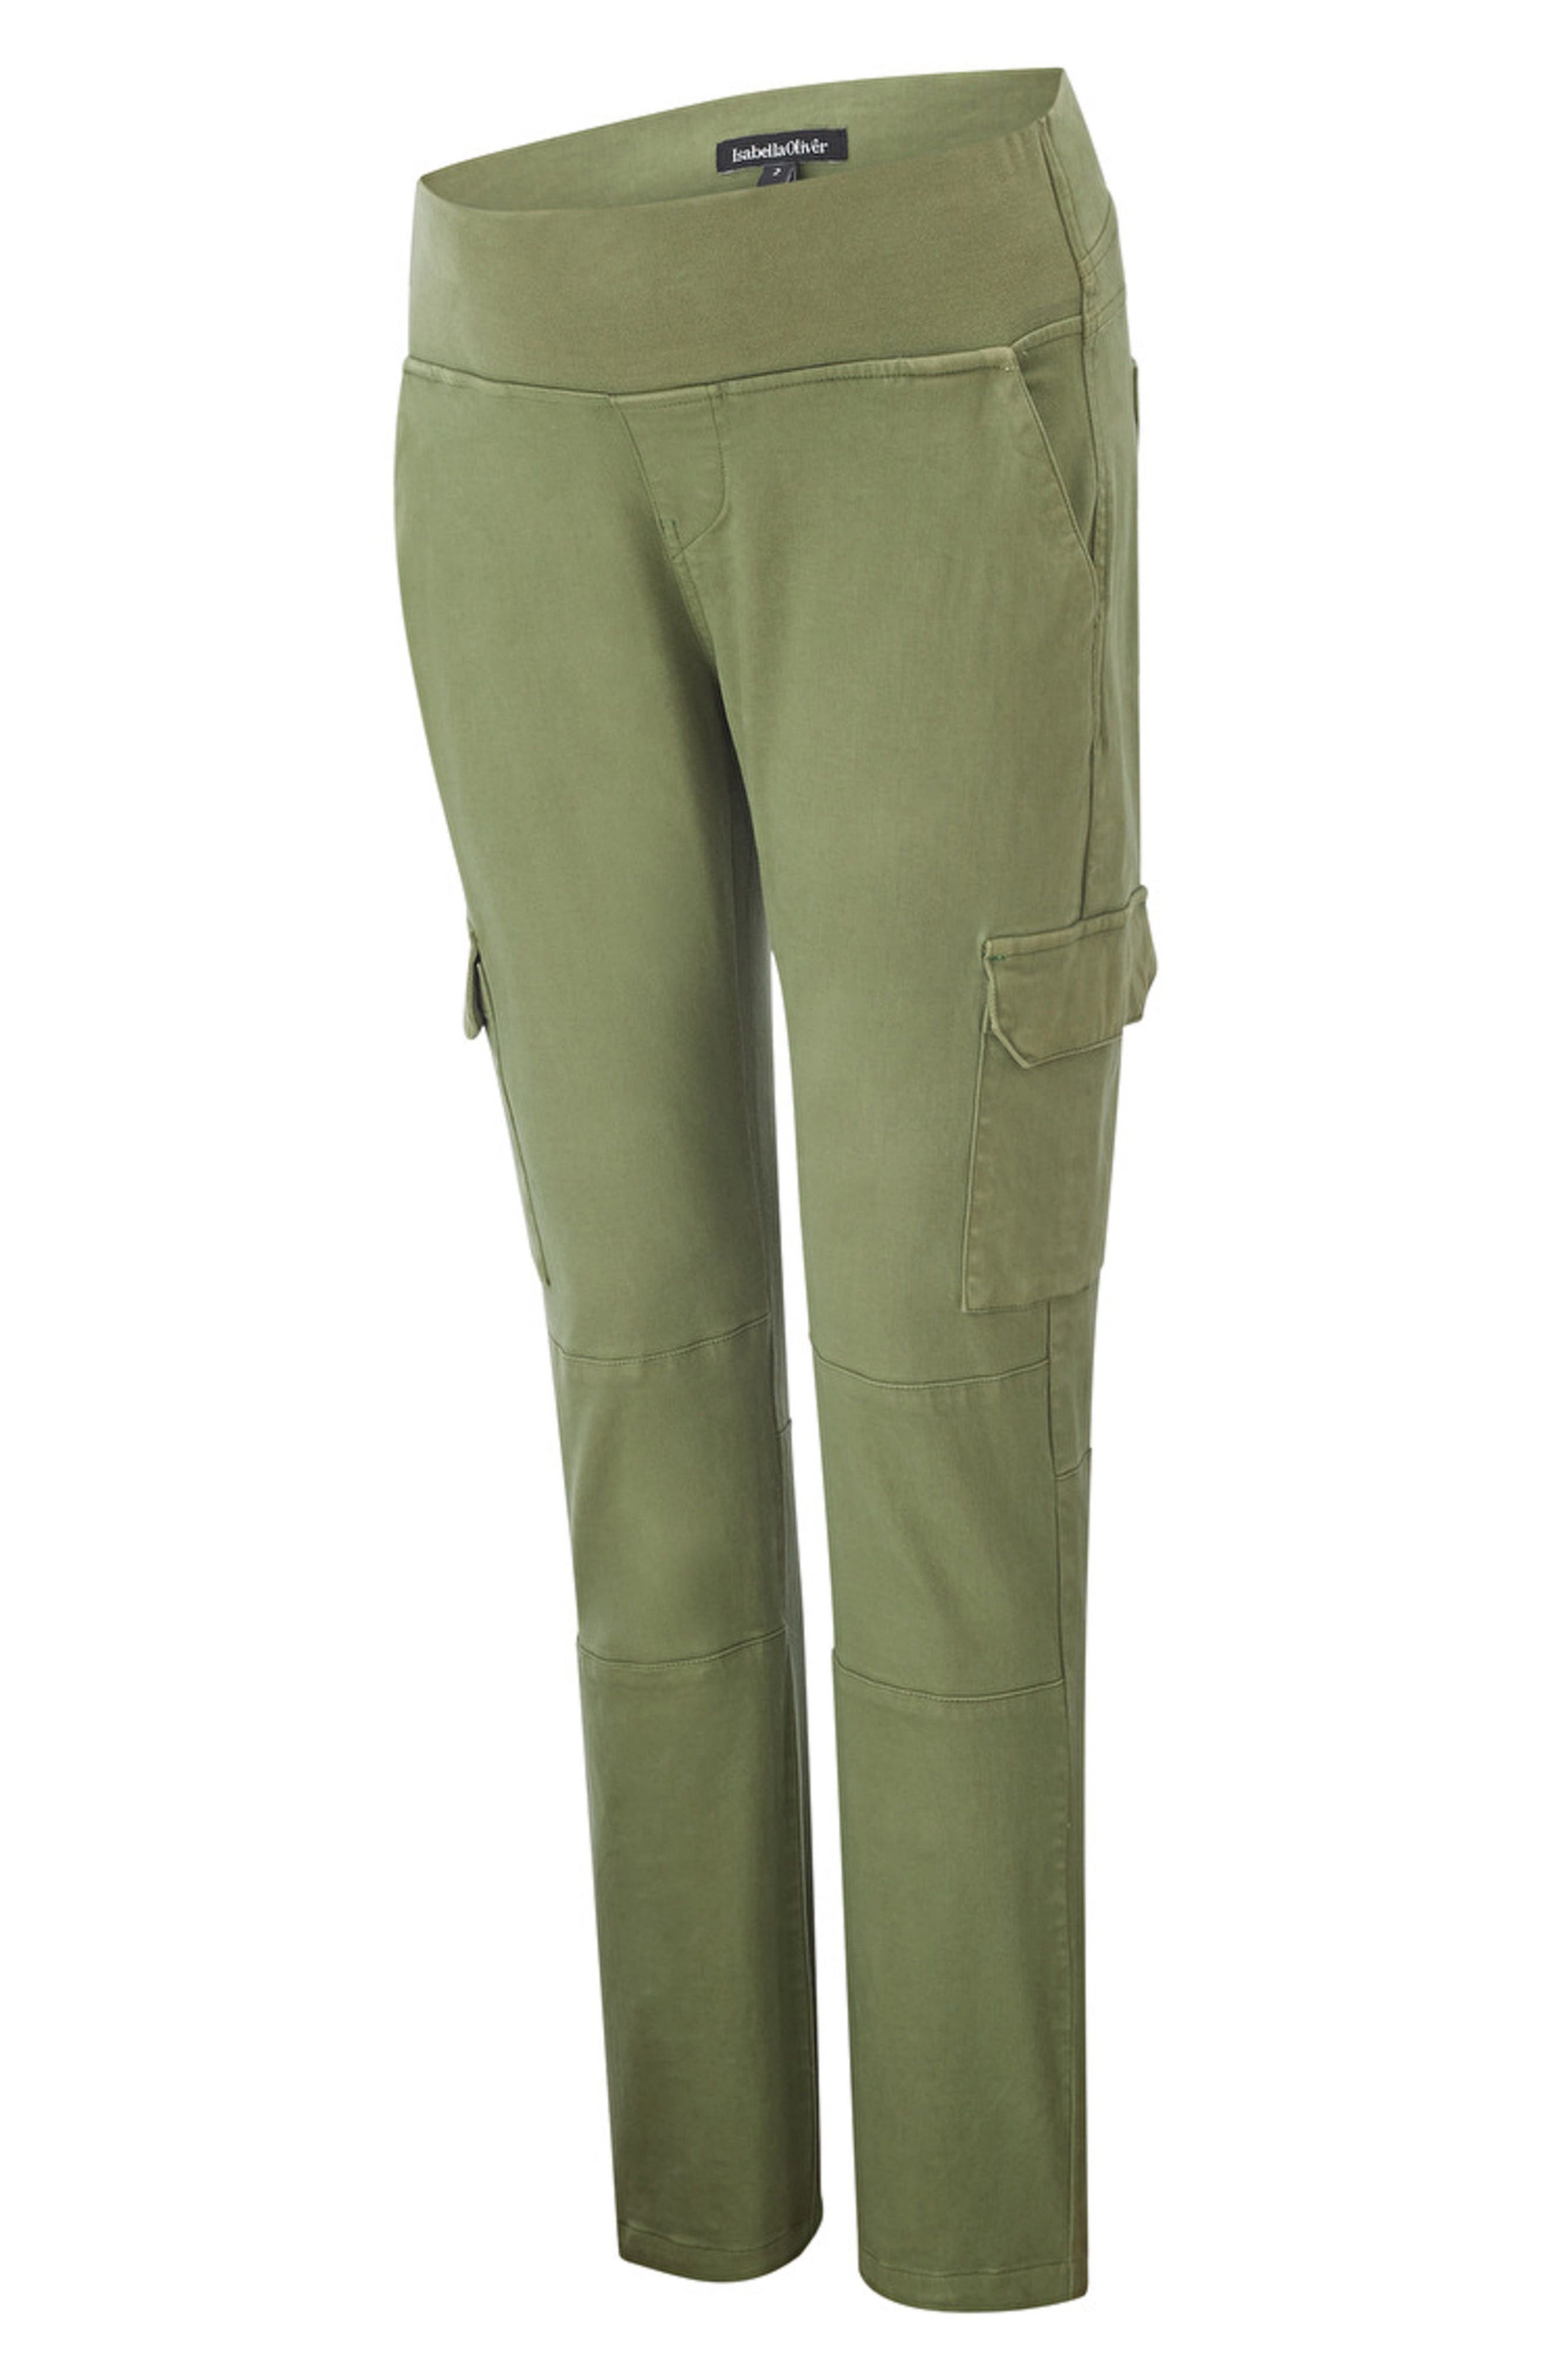 Maternity Cargo Pants,                         Main,                         color, Dusted Khaki